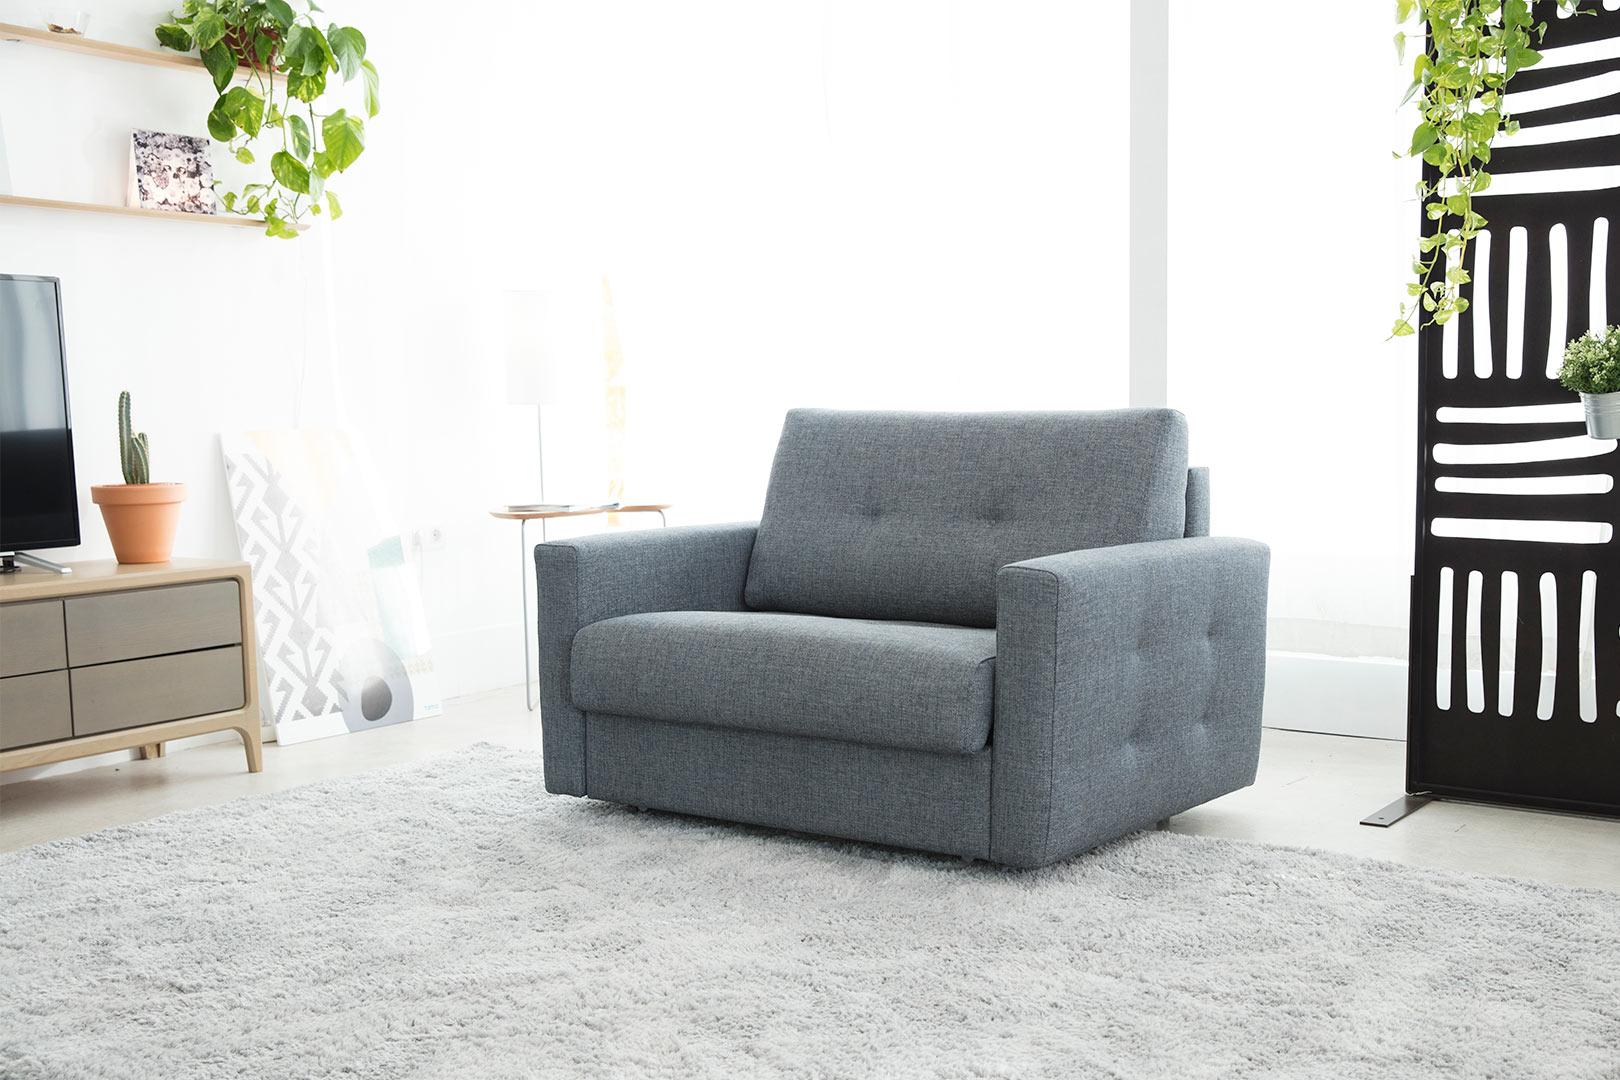 Bolero fama armchair bed 2020 02